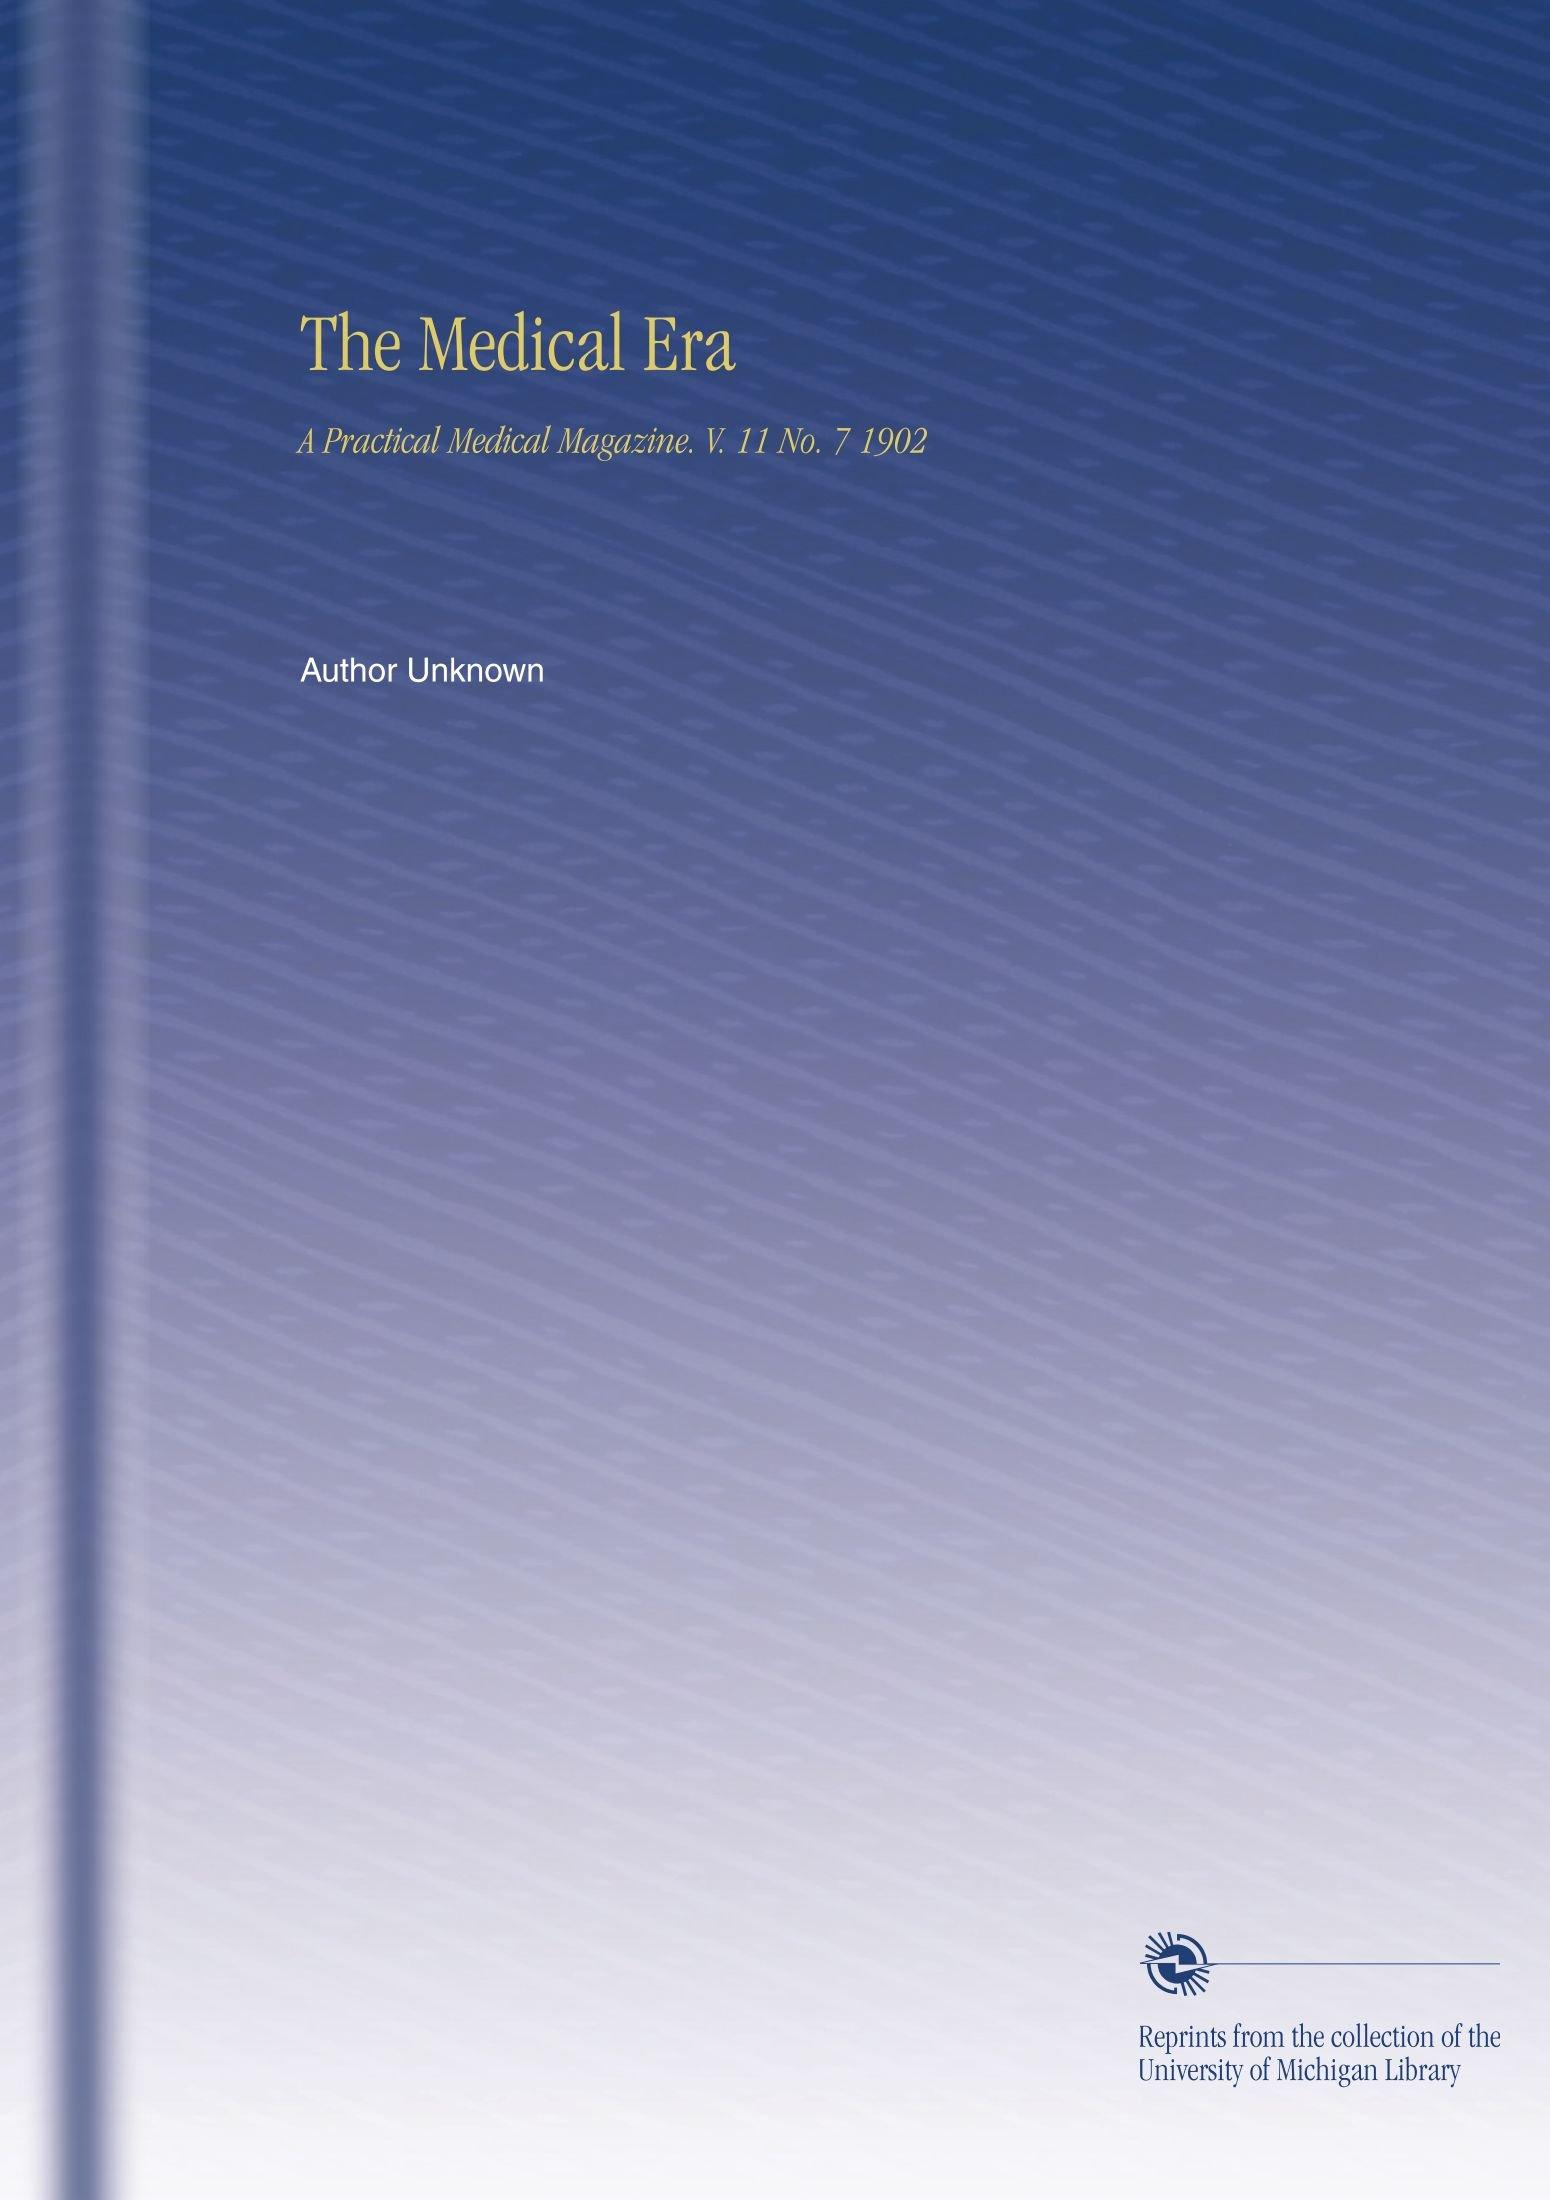 The Medical Era: A Practical Medical Magazine. V. 11 No. 7 1902 ebook